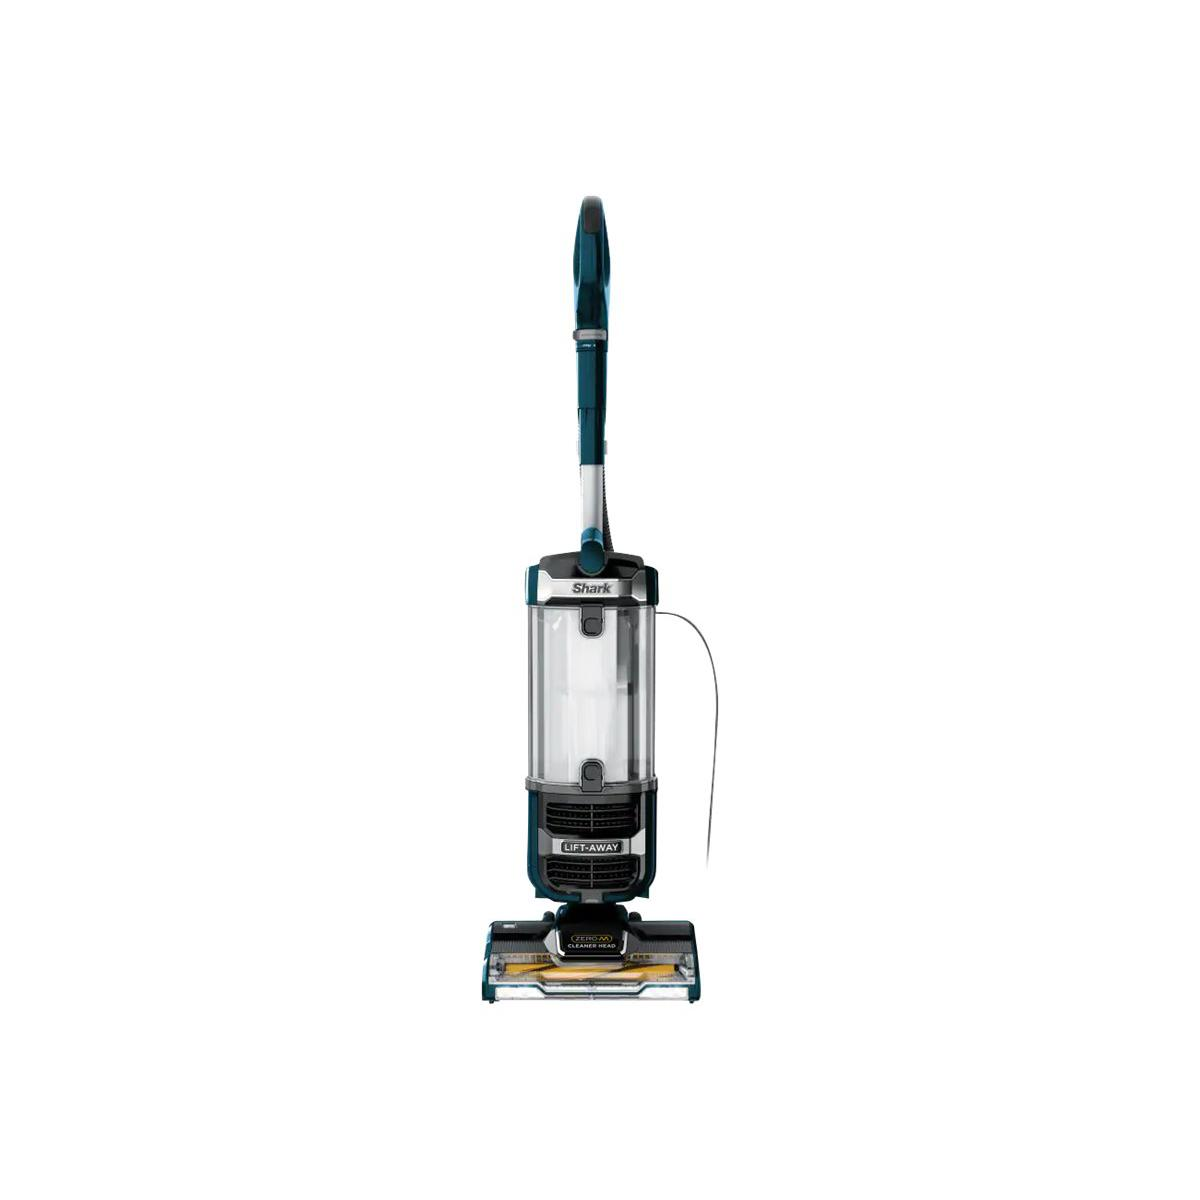 Upright wireless vacuum cleaner SHARK ZU572